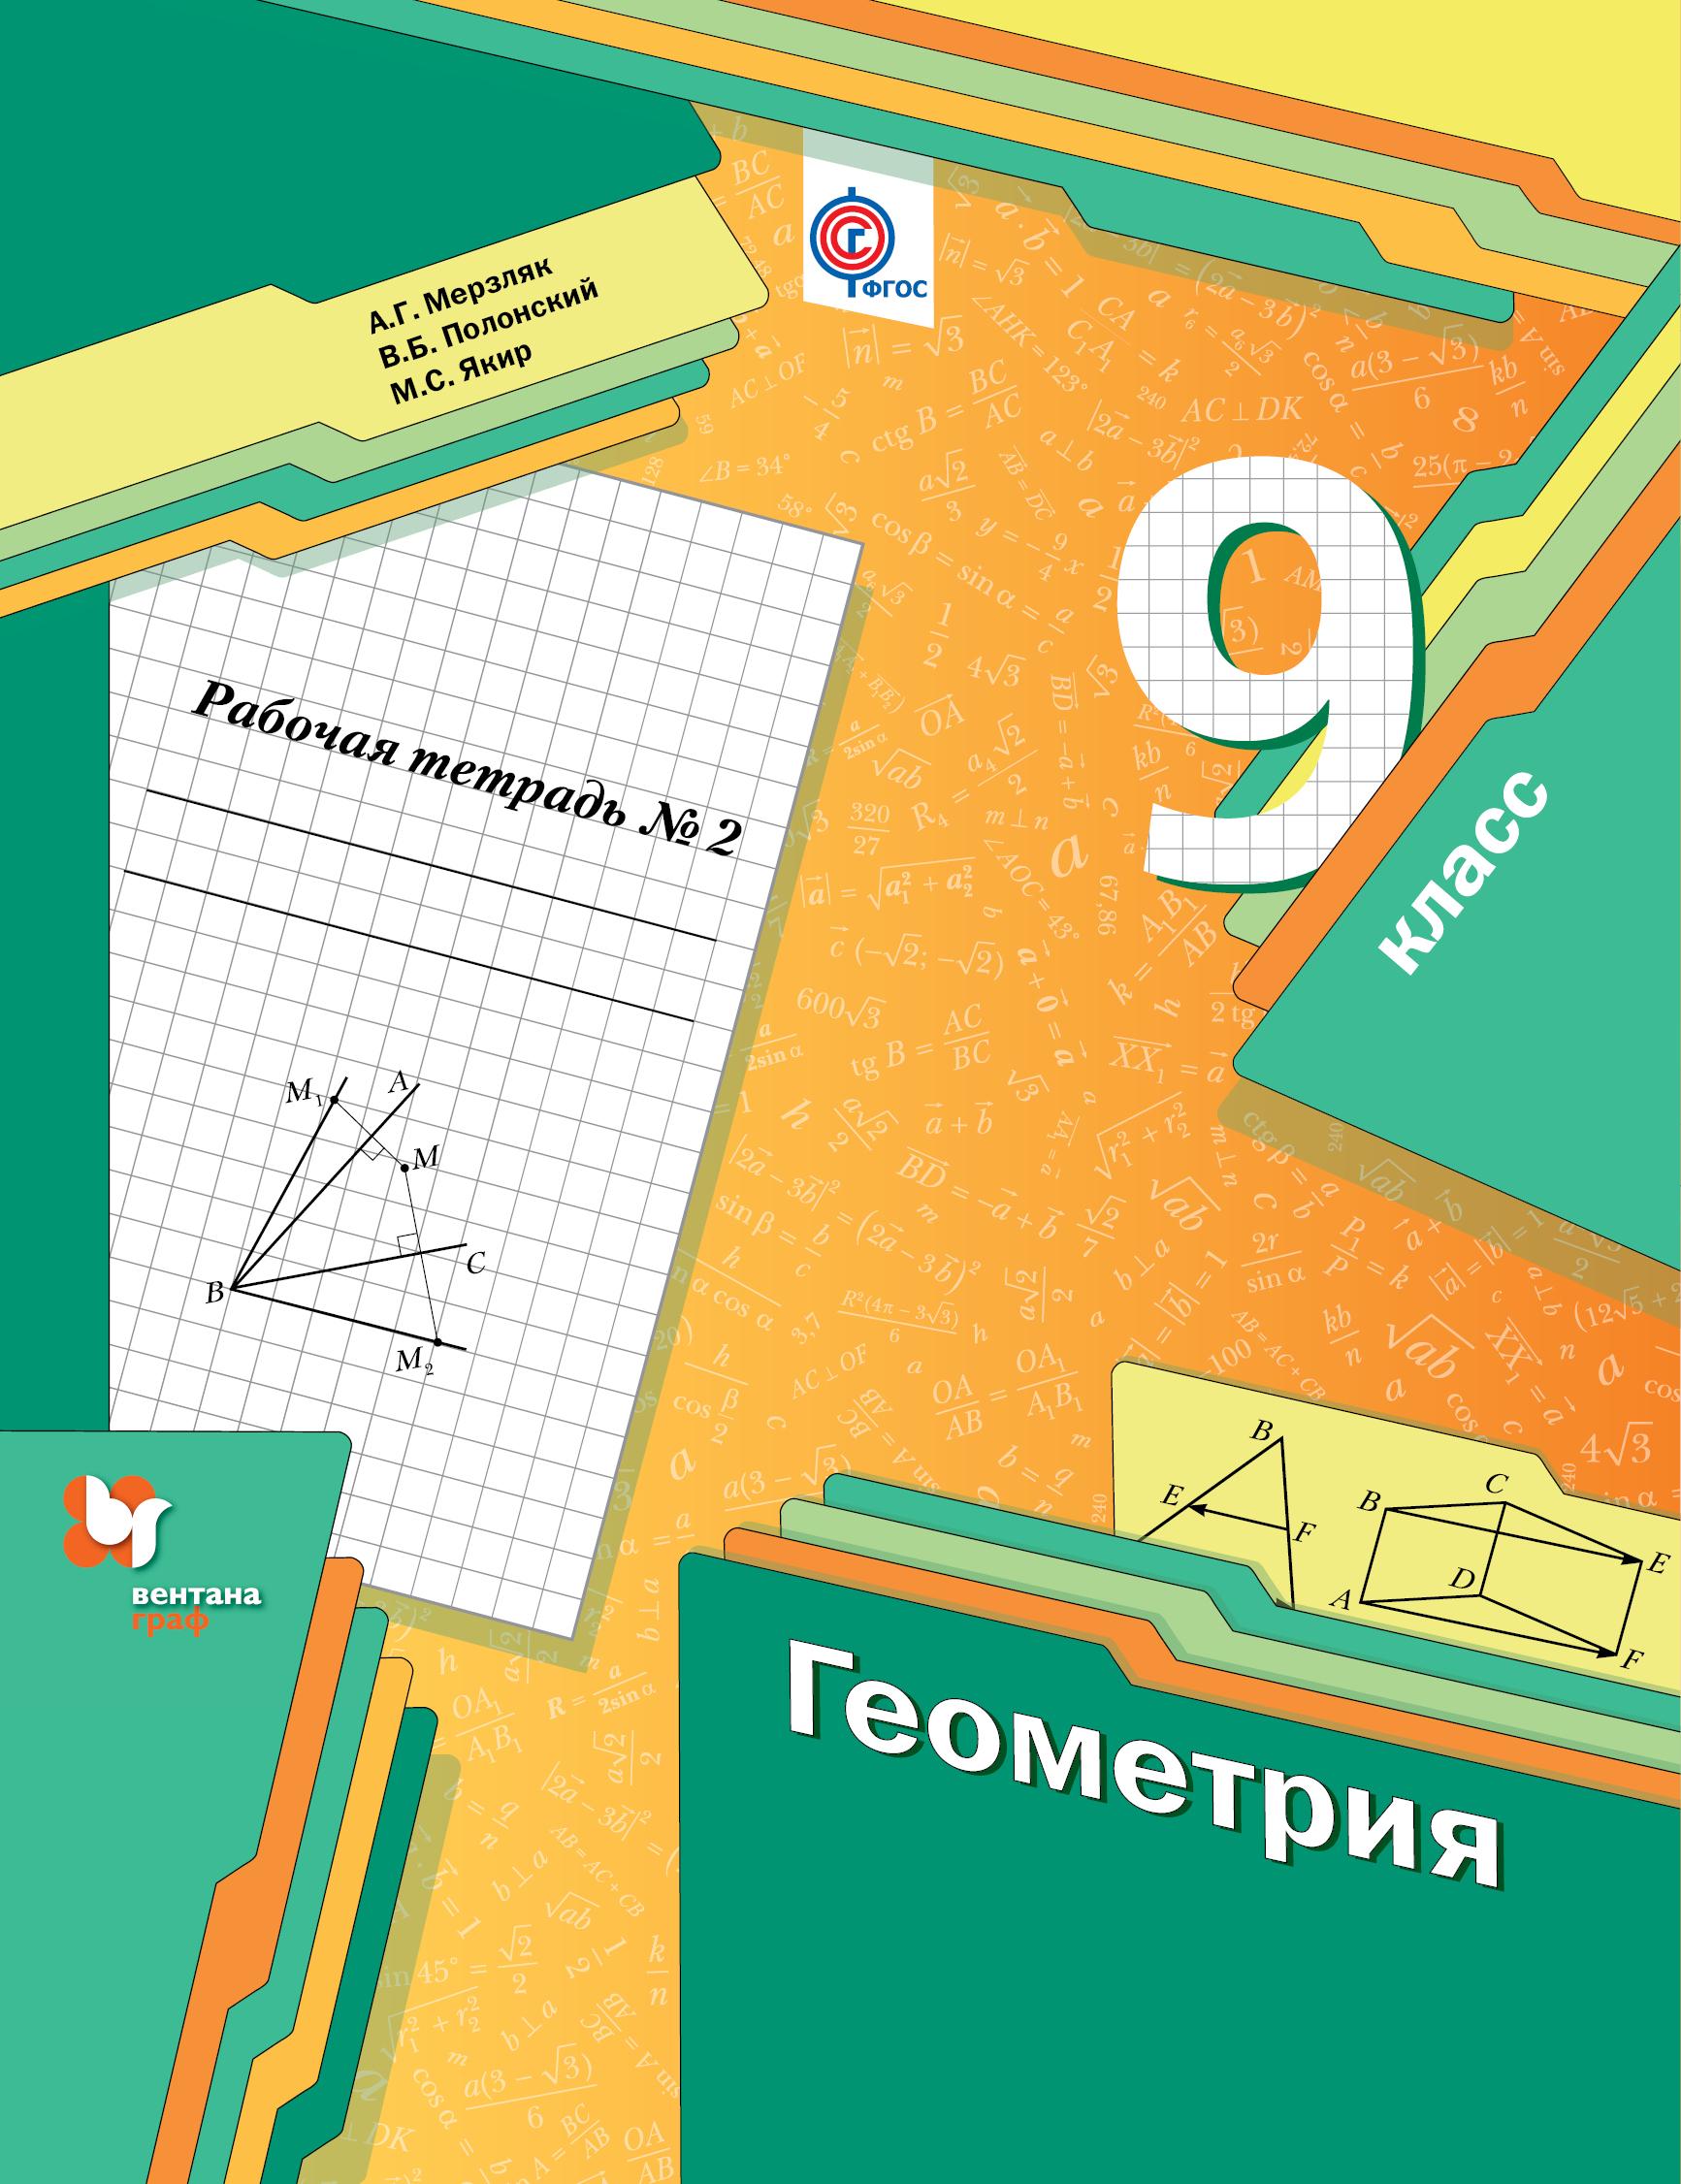 А. Г. Мерзляк, В. Б. Полонский, Я. М. Семенович Геометрия. 9класс. Рабочая тетрадь №2 цены онлайн